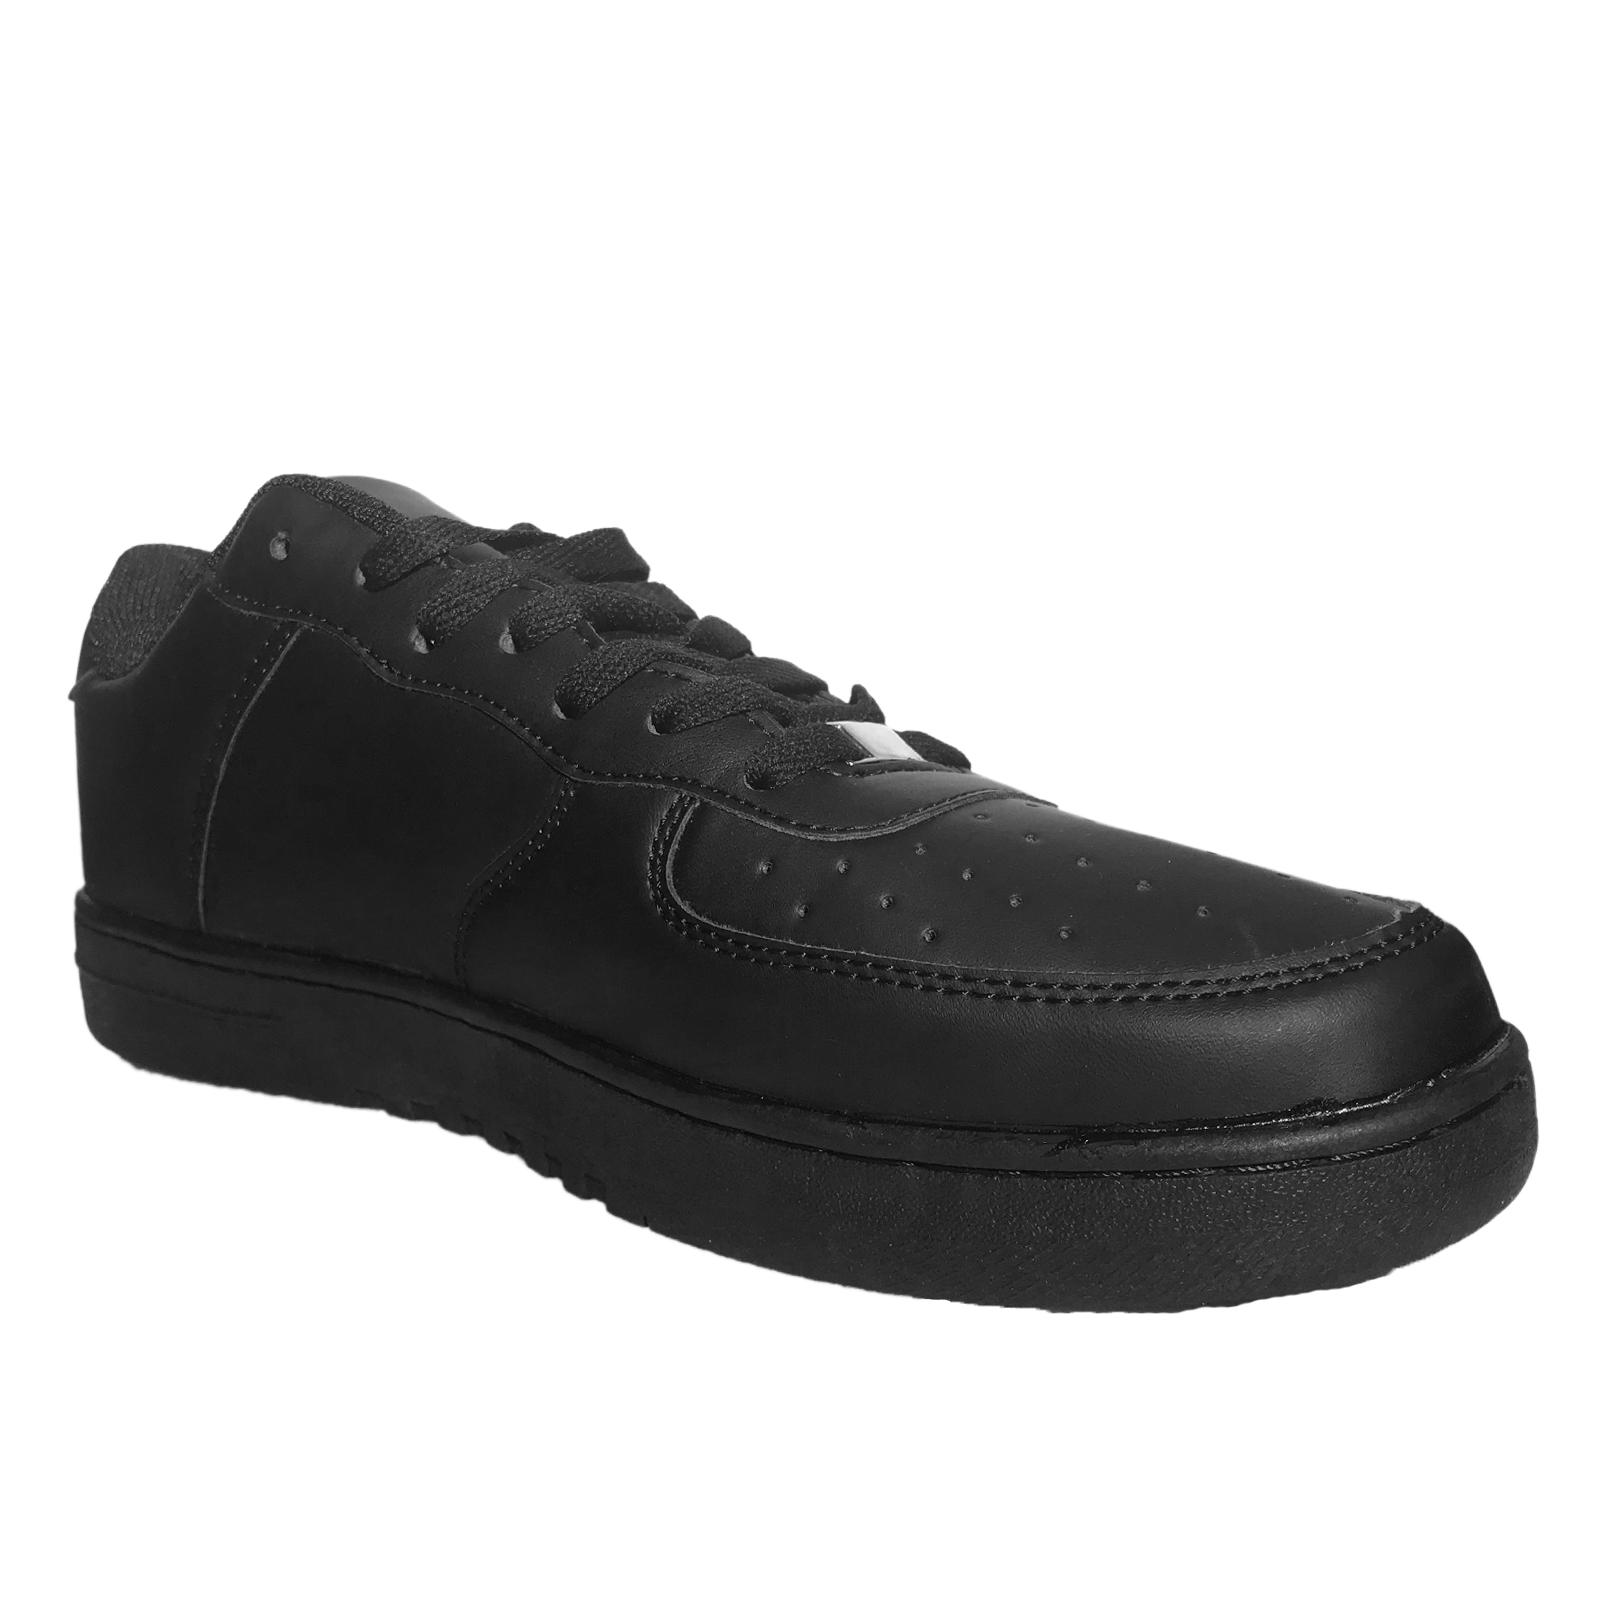 Scarpe-Ginnastica-Uomo-Pelle-PU-Nero-Running-Passeggio-Tipo-Nike miniatura 12